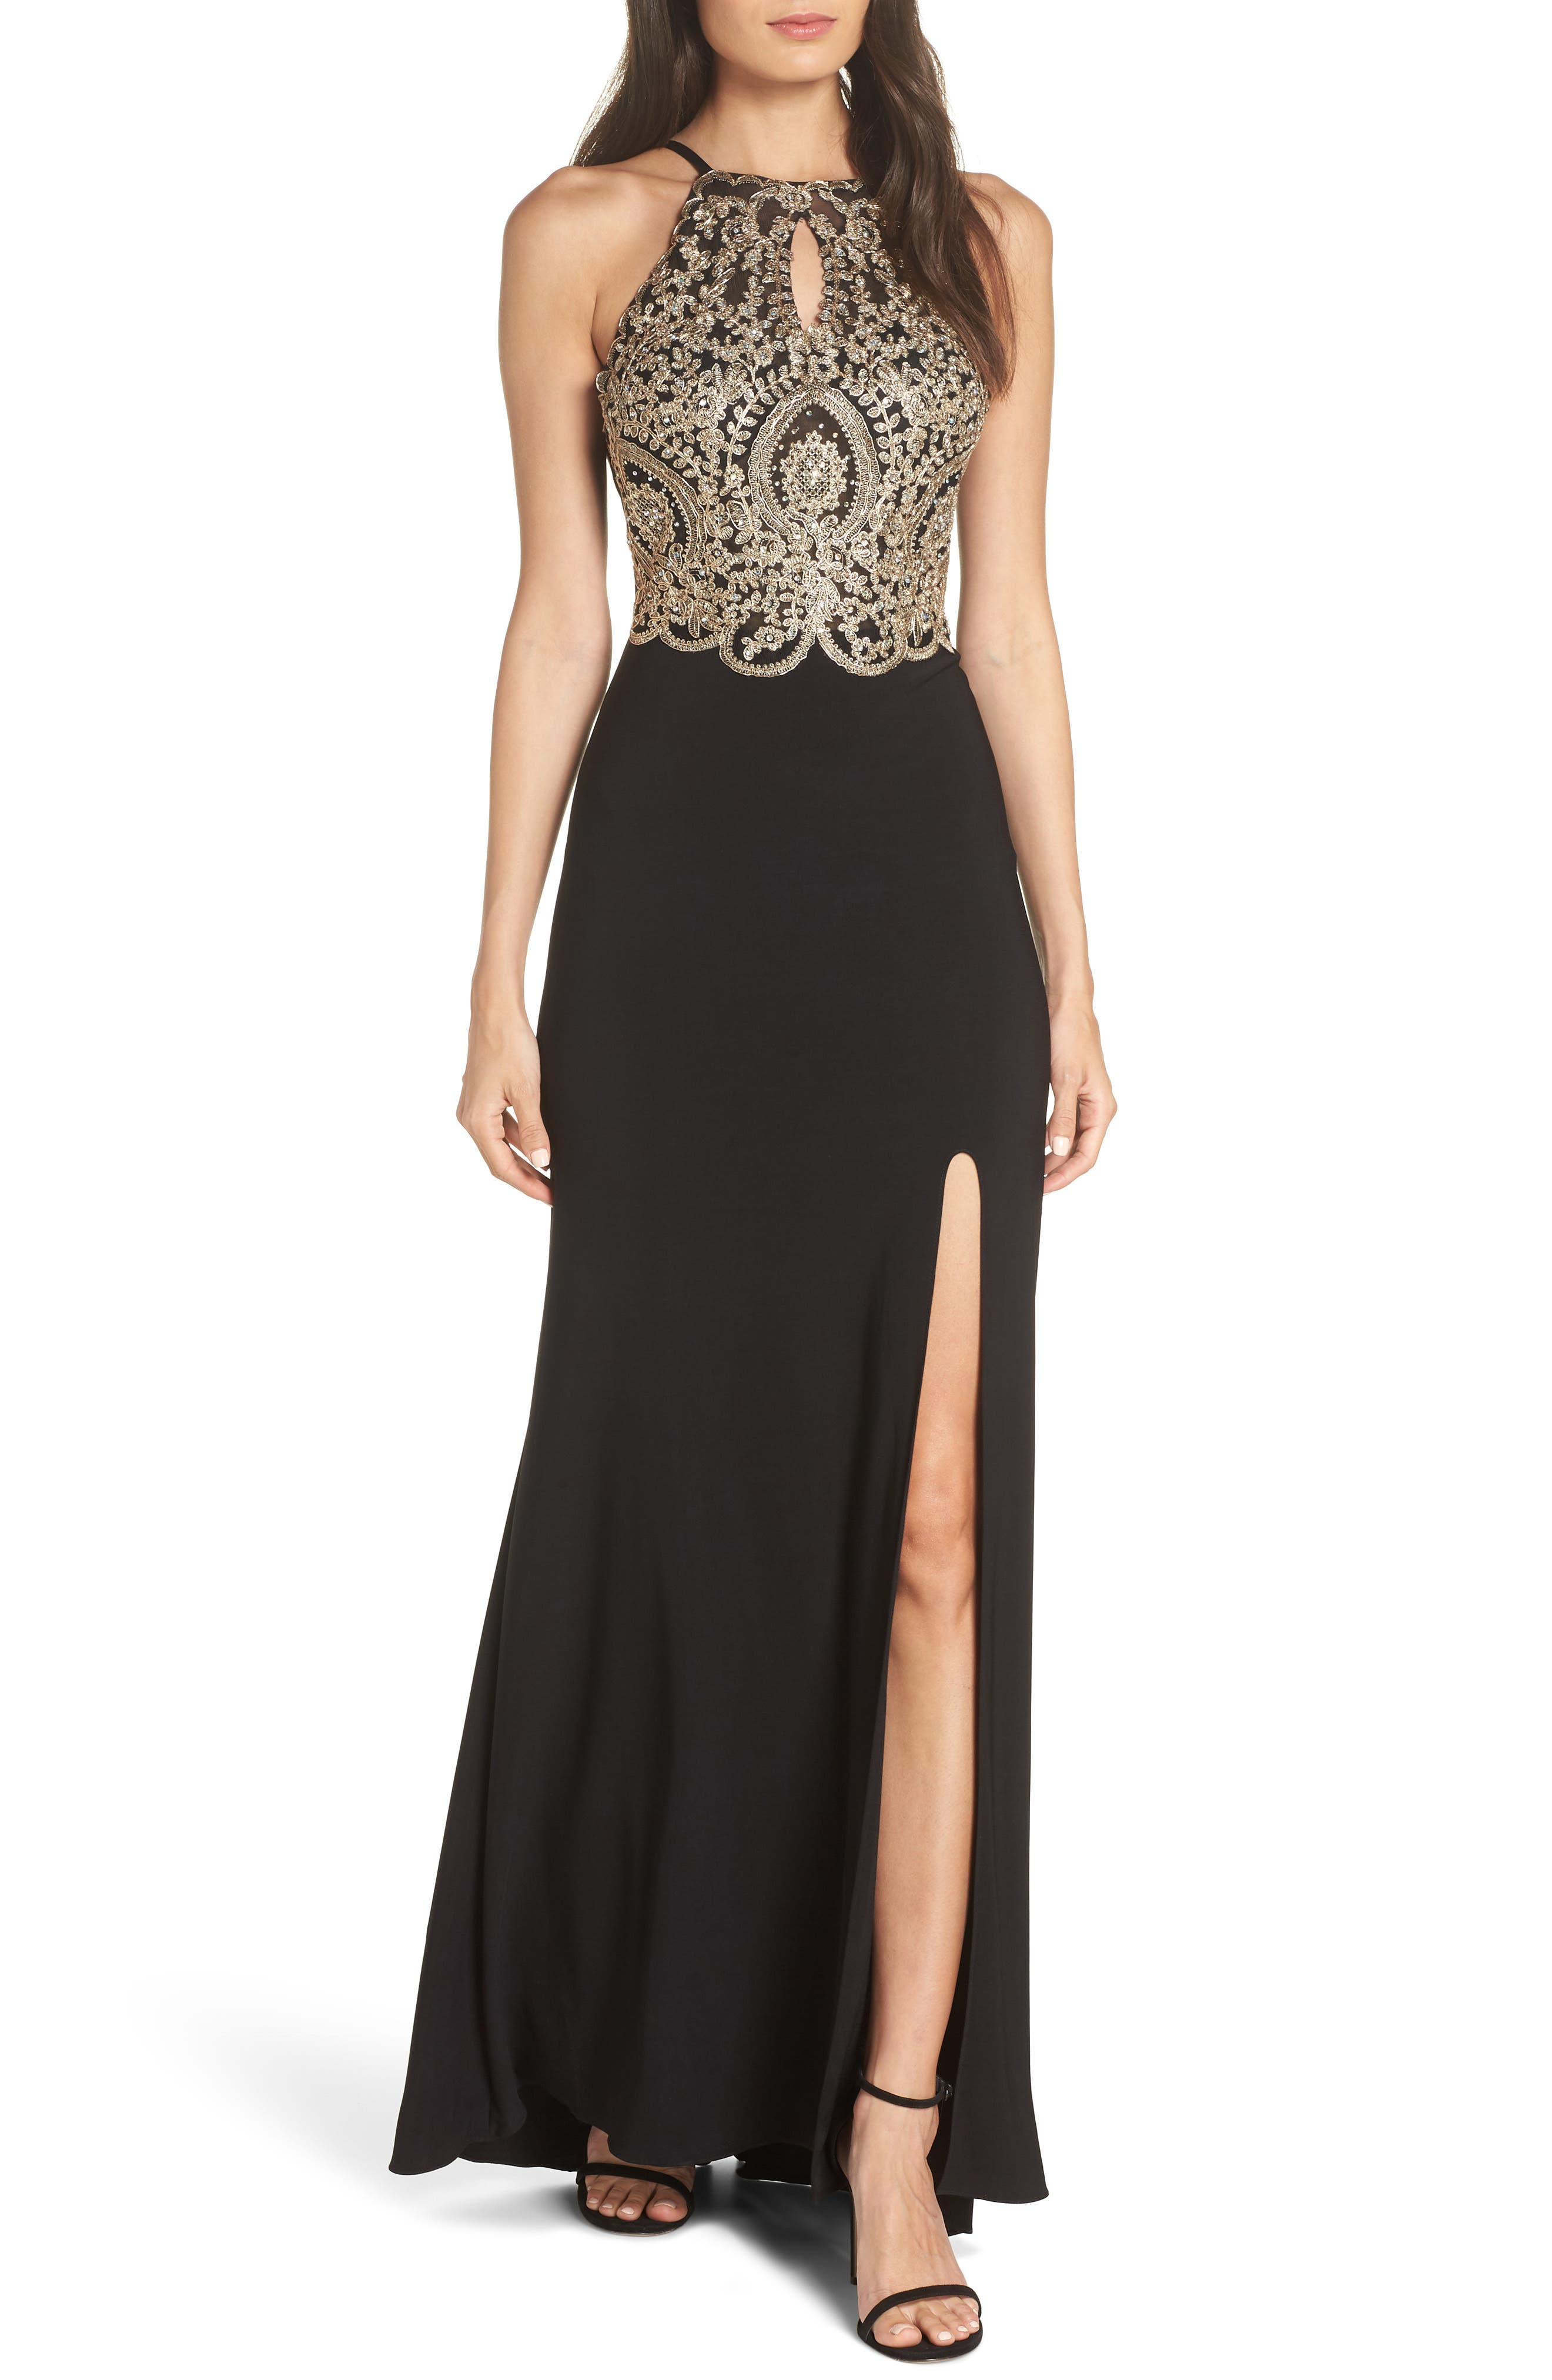 Blondie Nites Embellished Applique Halter Gown, Metallic